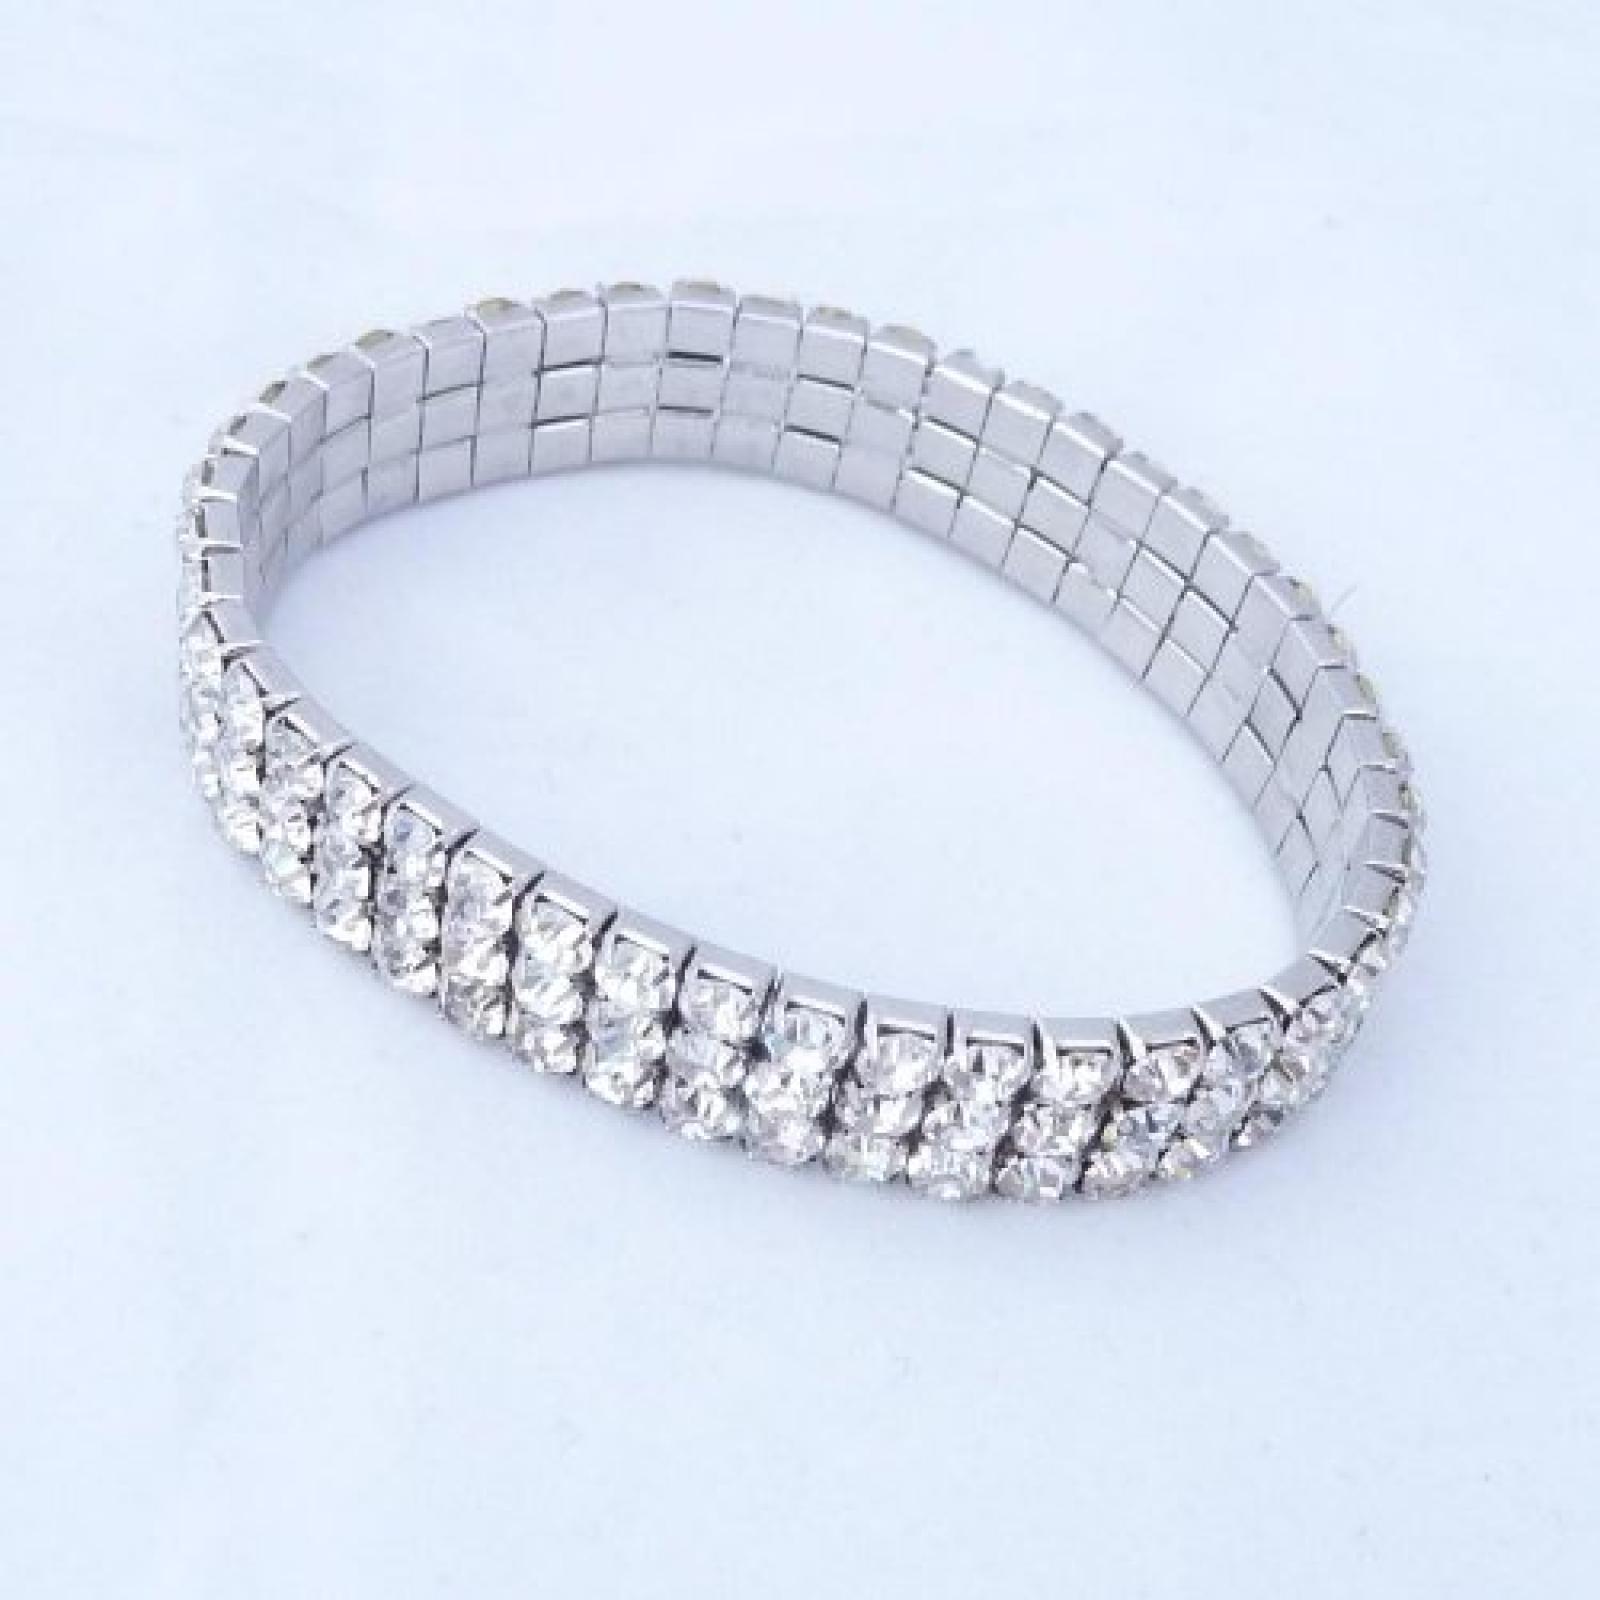 Pierre Cardin Fashion Bijoux Bracelet